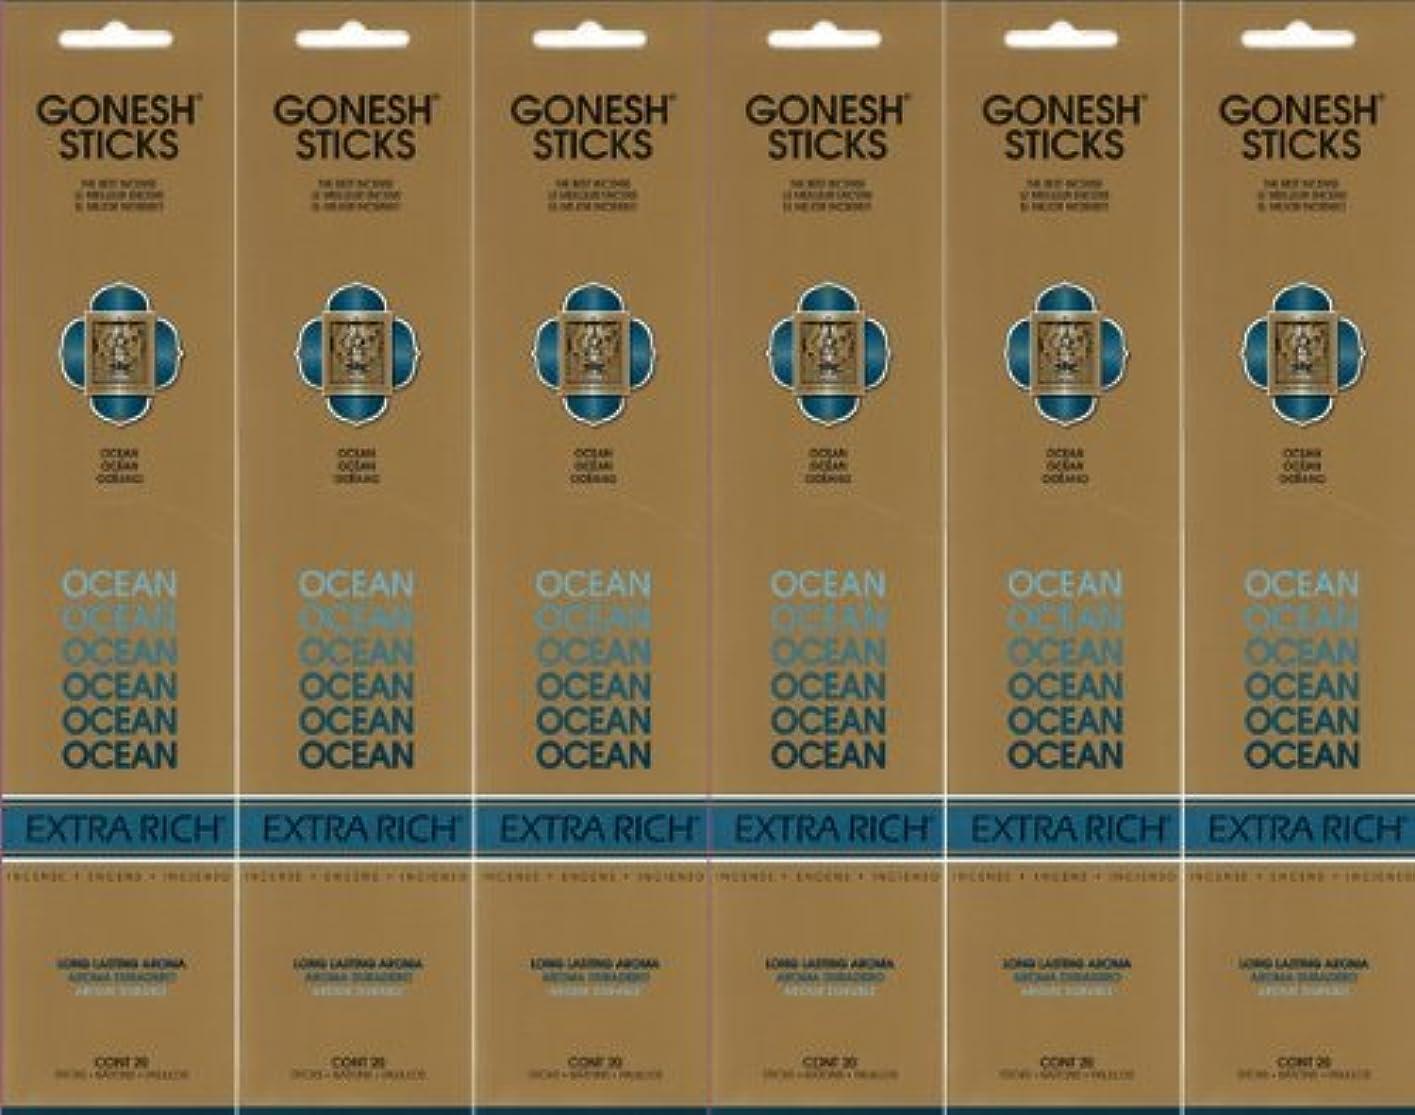 GONESH ガーネッシュ OCEAN オーシャン スティック 20本入り X 6パック (120本)